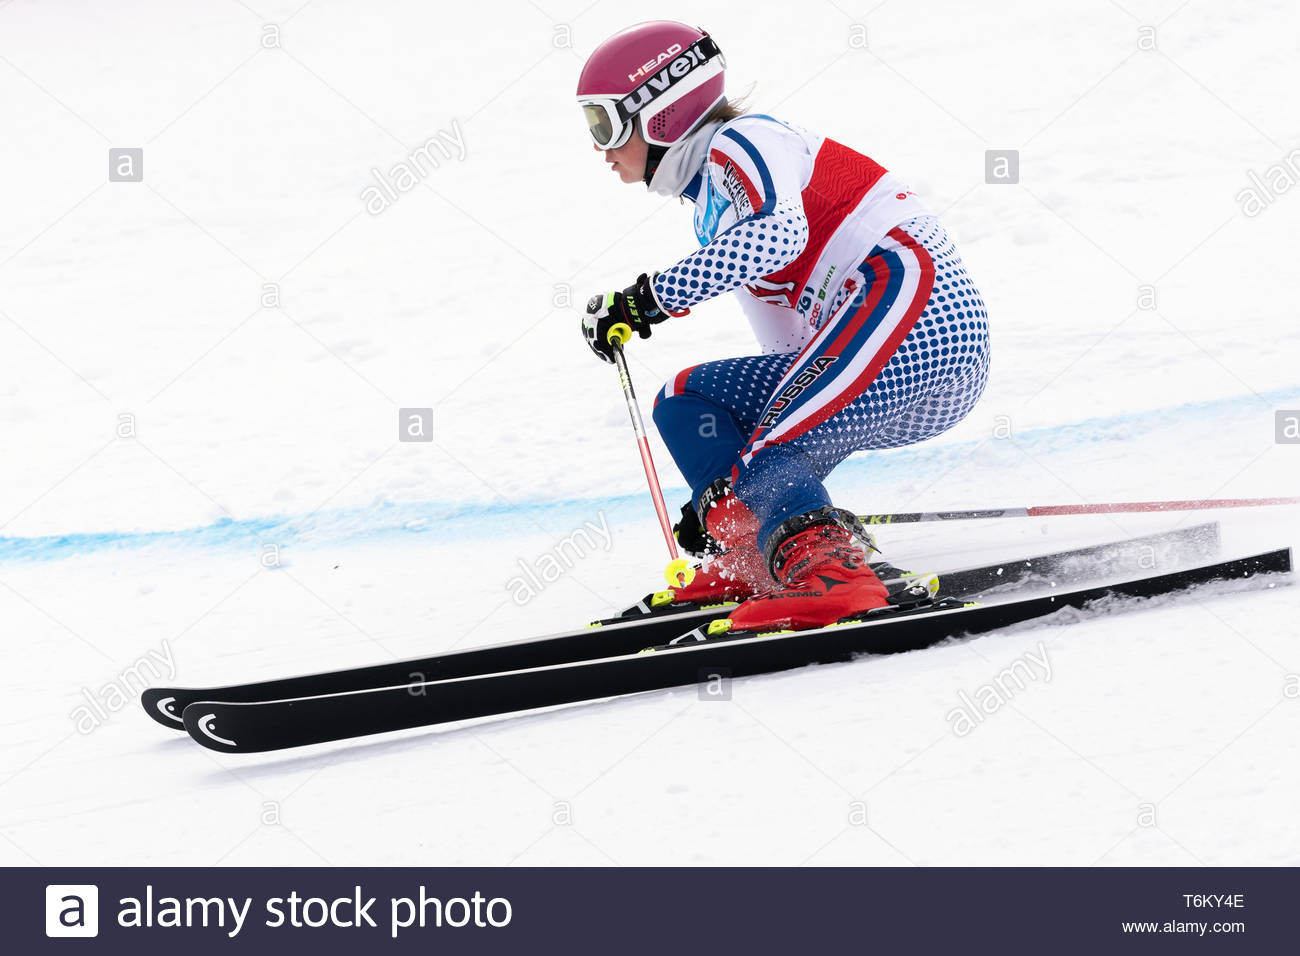 KAMCHATKA PENINSULA, RUSSIA - APRIL 2, 2019: International Ski Federation Championship, Russian Women's Alpine Skiing Cup, giant slalom. Mountain skie - Stock Image